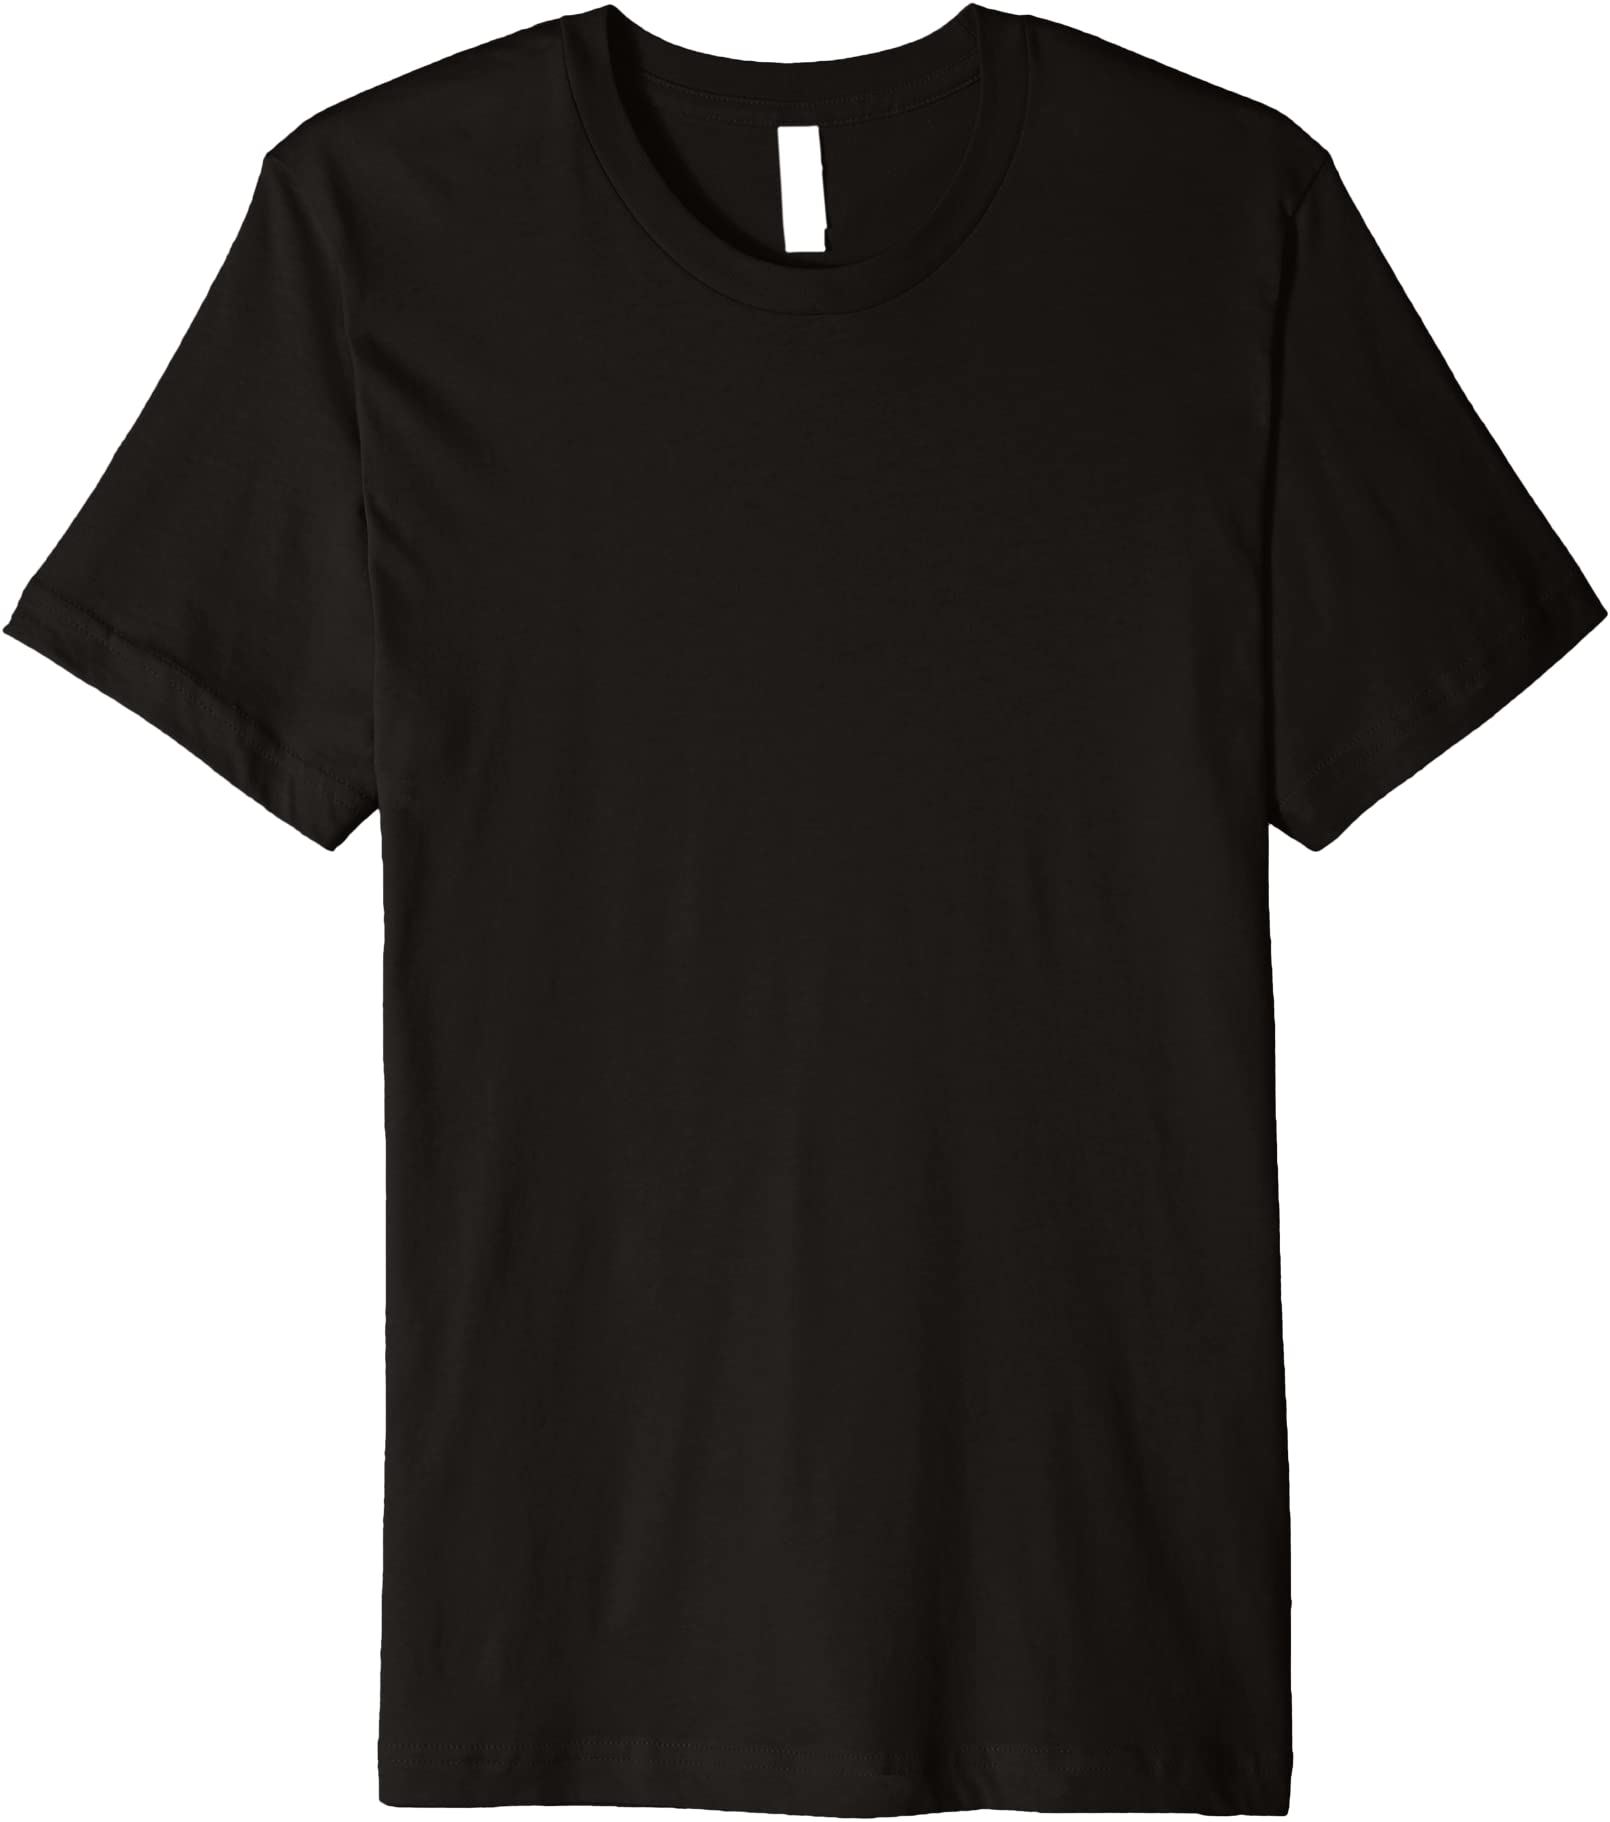 BlountDecor Casual Short Sleeve Graphic Tee Shirts,Heart Shaped Candy Desing Fashion Personality Customization